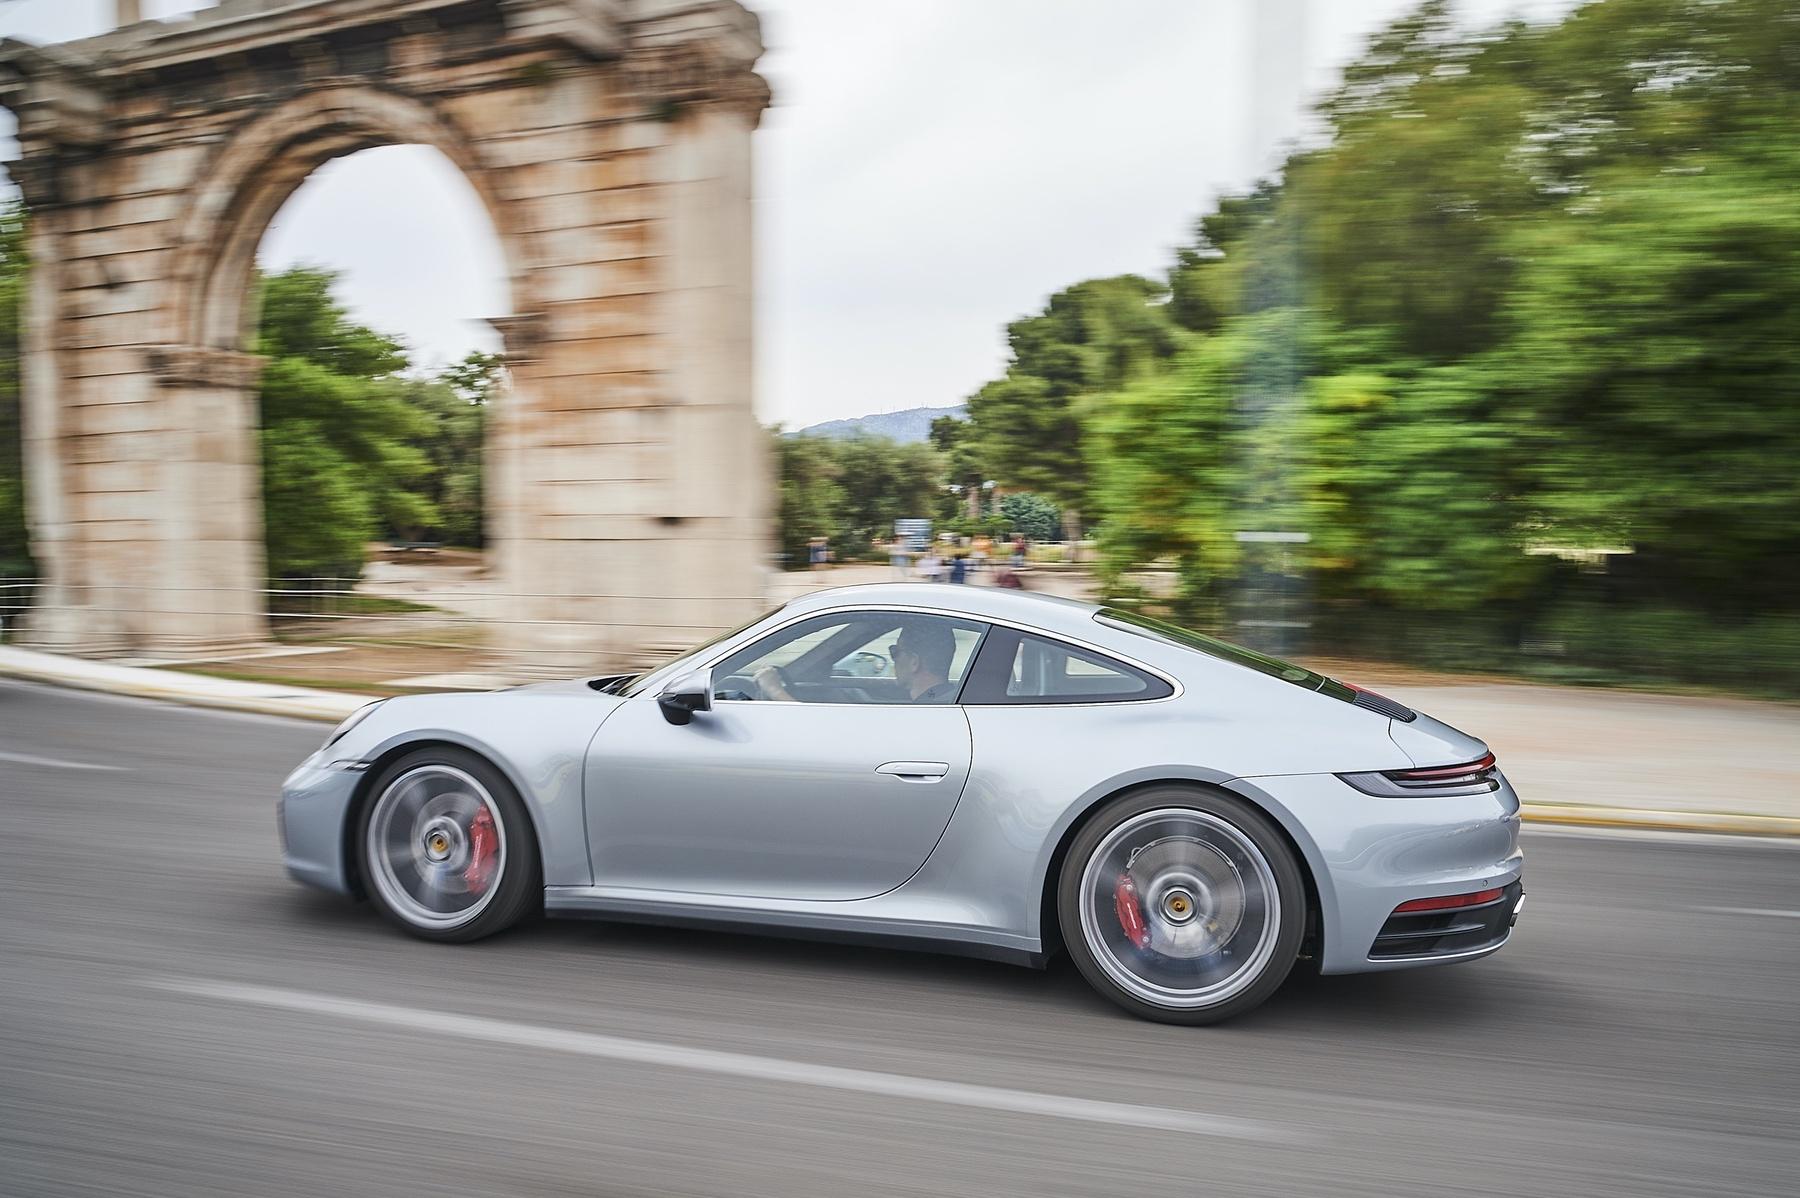 Test_Drive_Porsche_911_Athens_0183